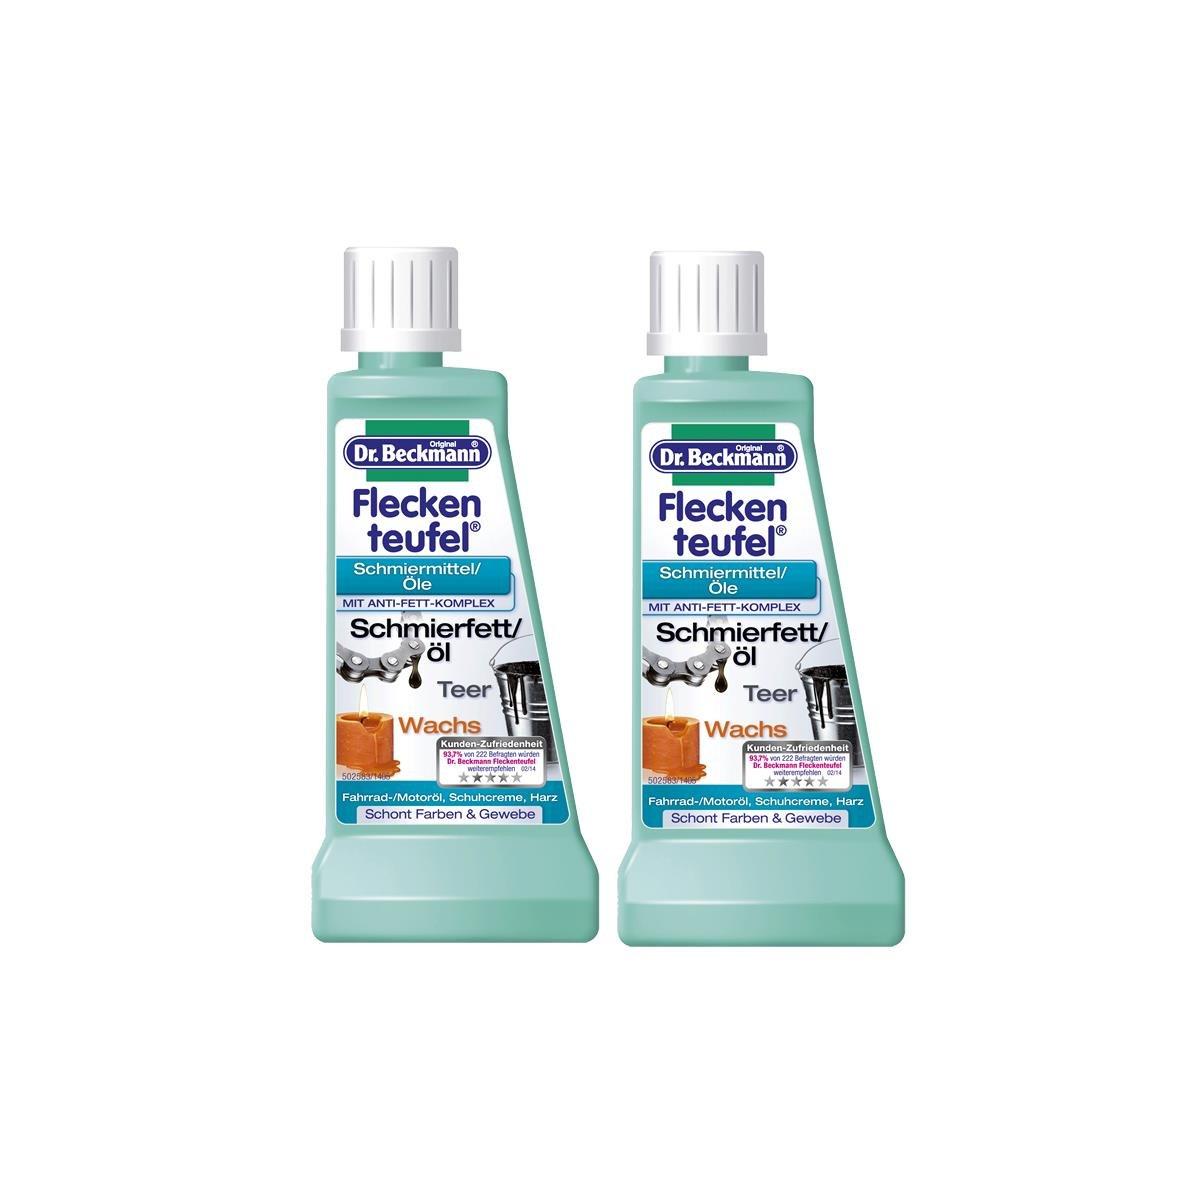 2 x Dr. Beckmann mancha lubricantes diablo aceites 50 ml - con anti-grasa complejo: Amazon.es: Hogar